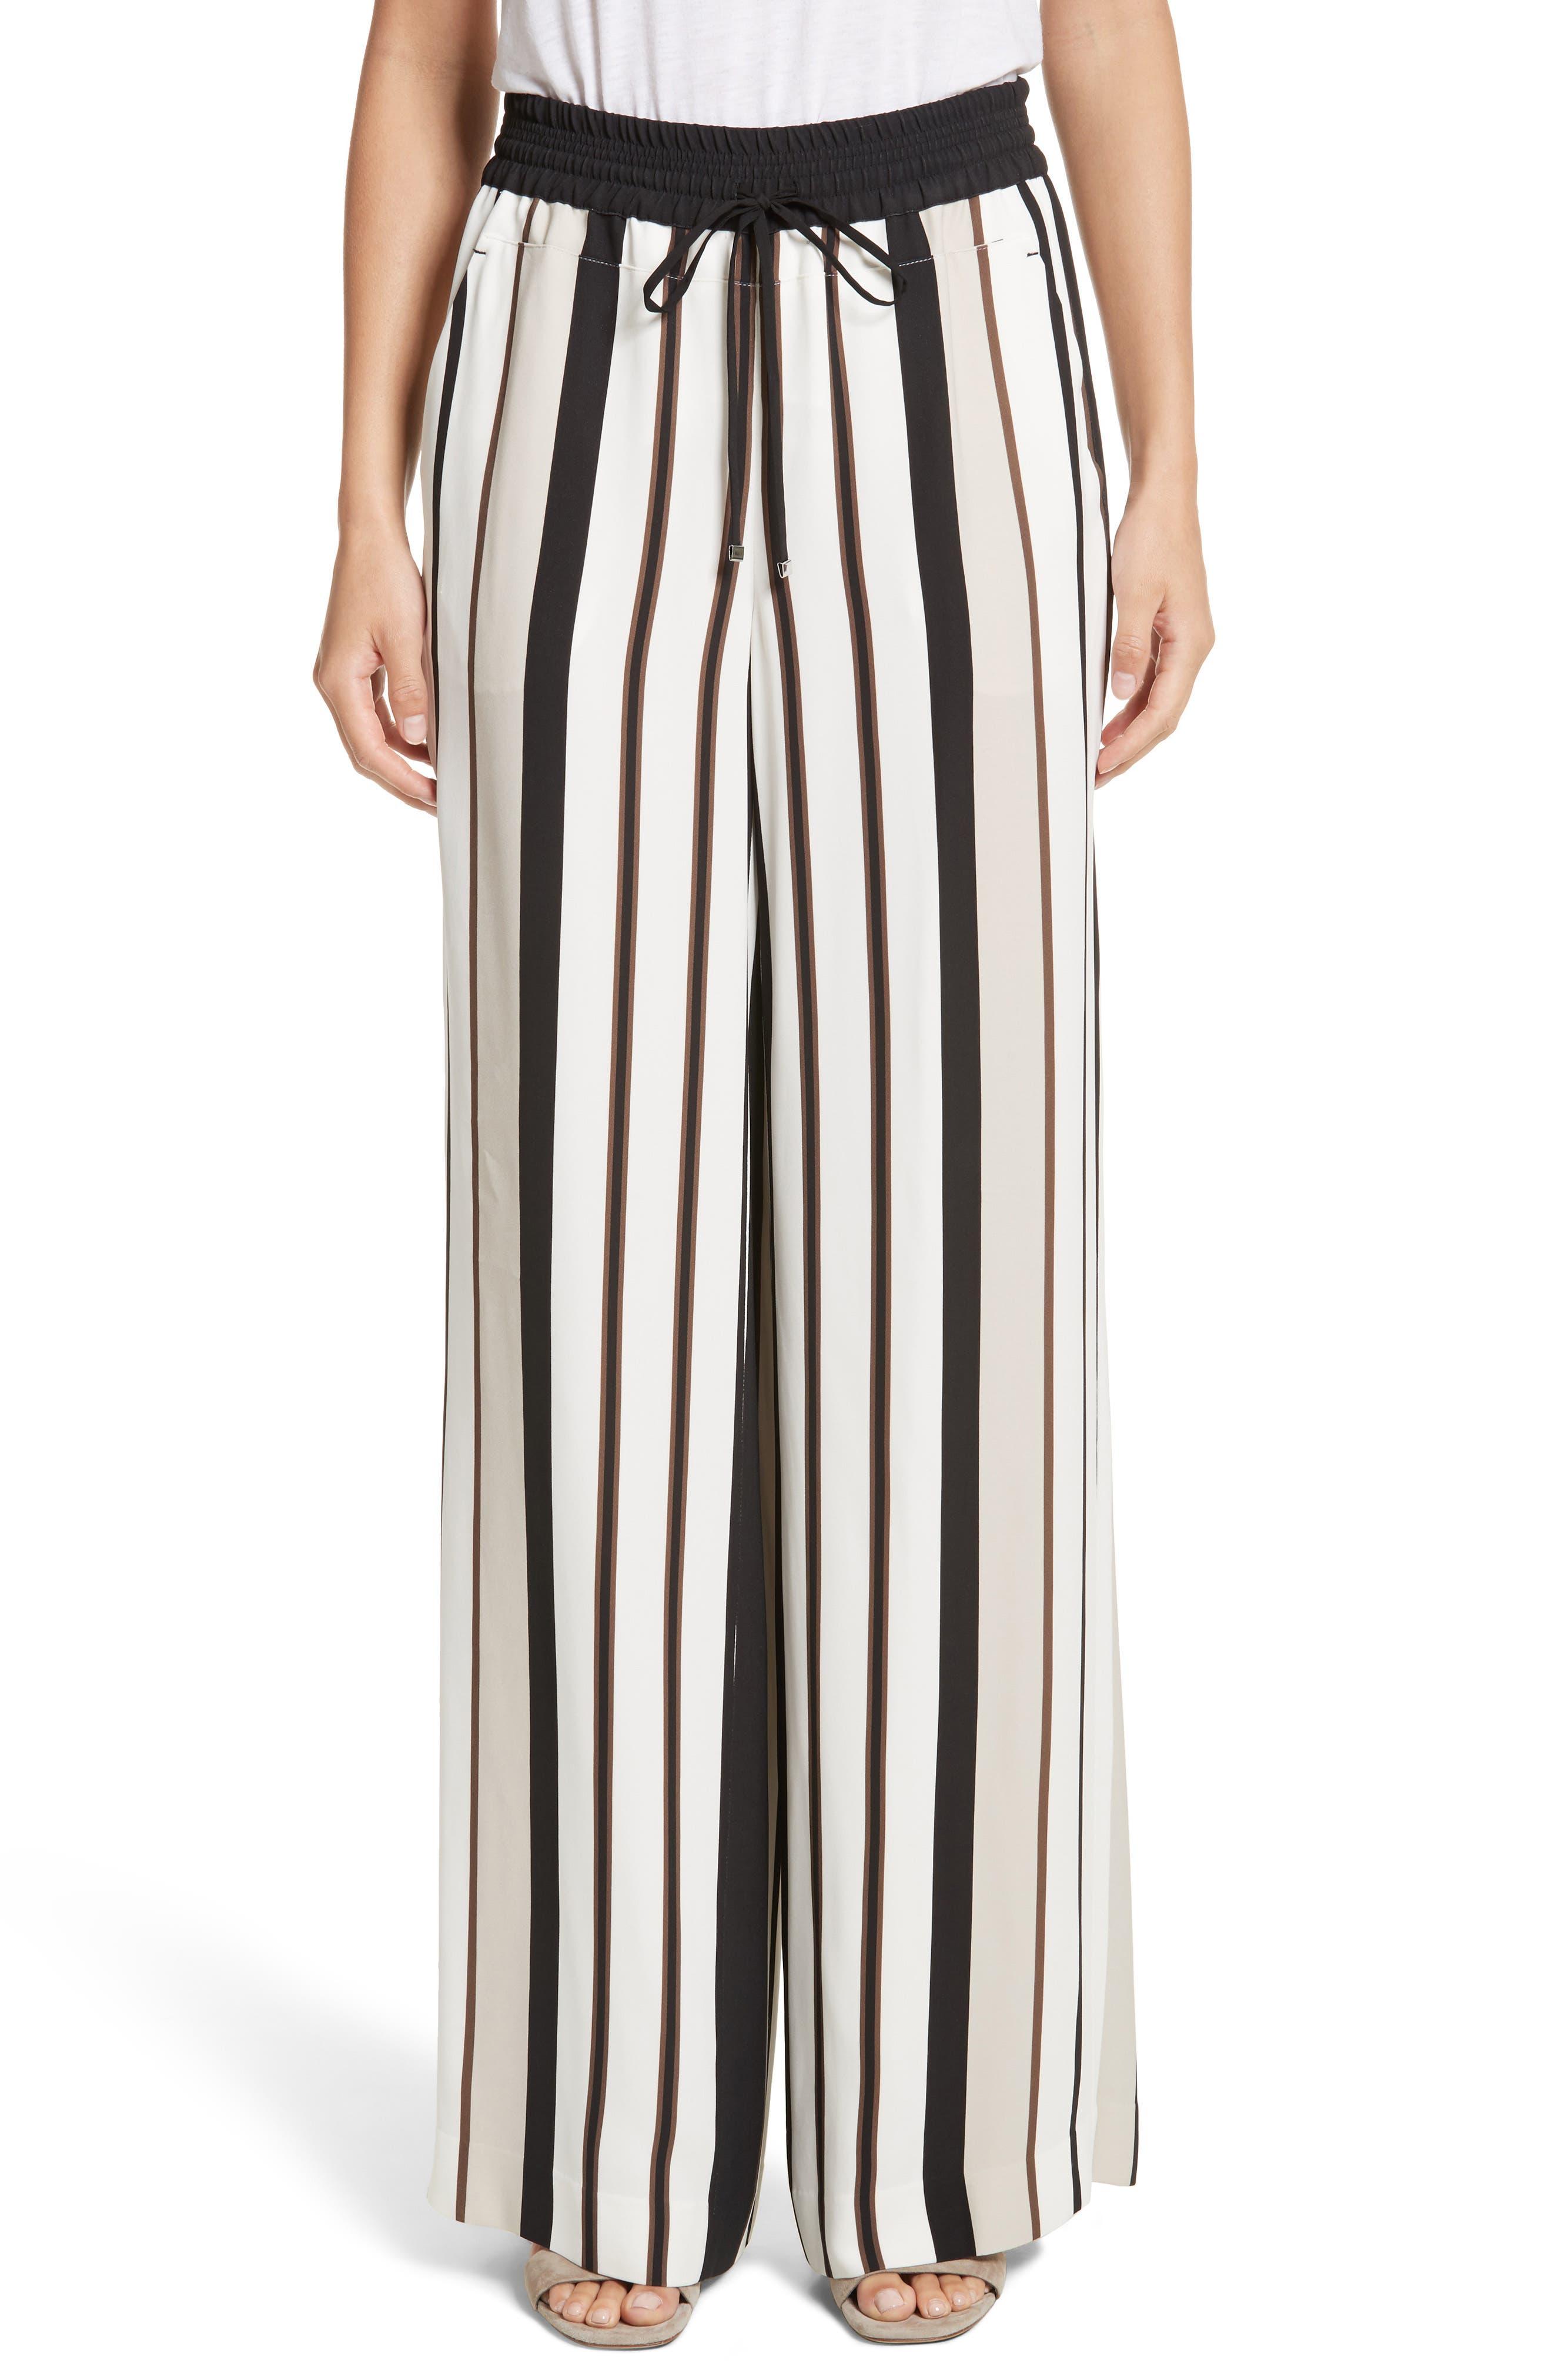 Allen Legacy Stripe Drape Cloth Pants,                             Main thumbnail 1, color,                             Black Multi